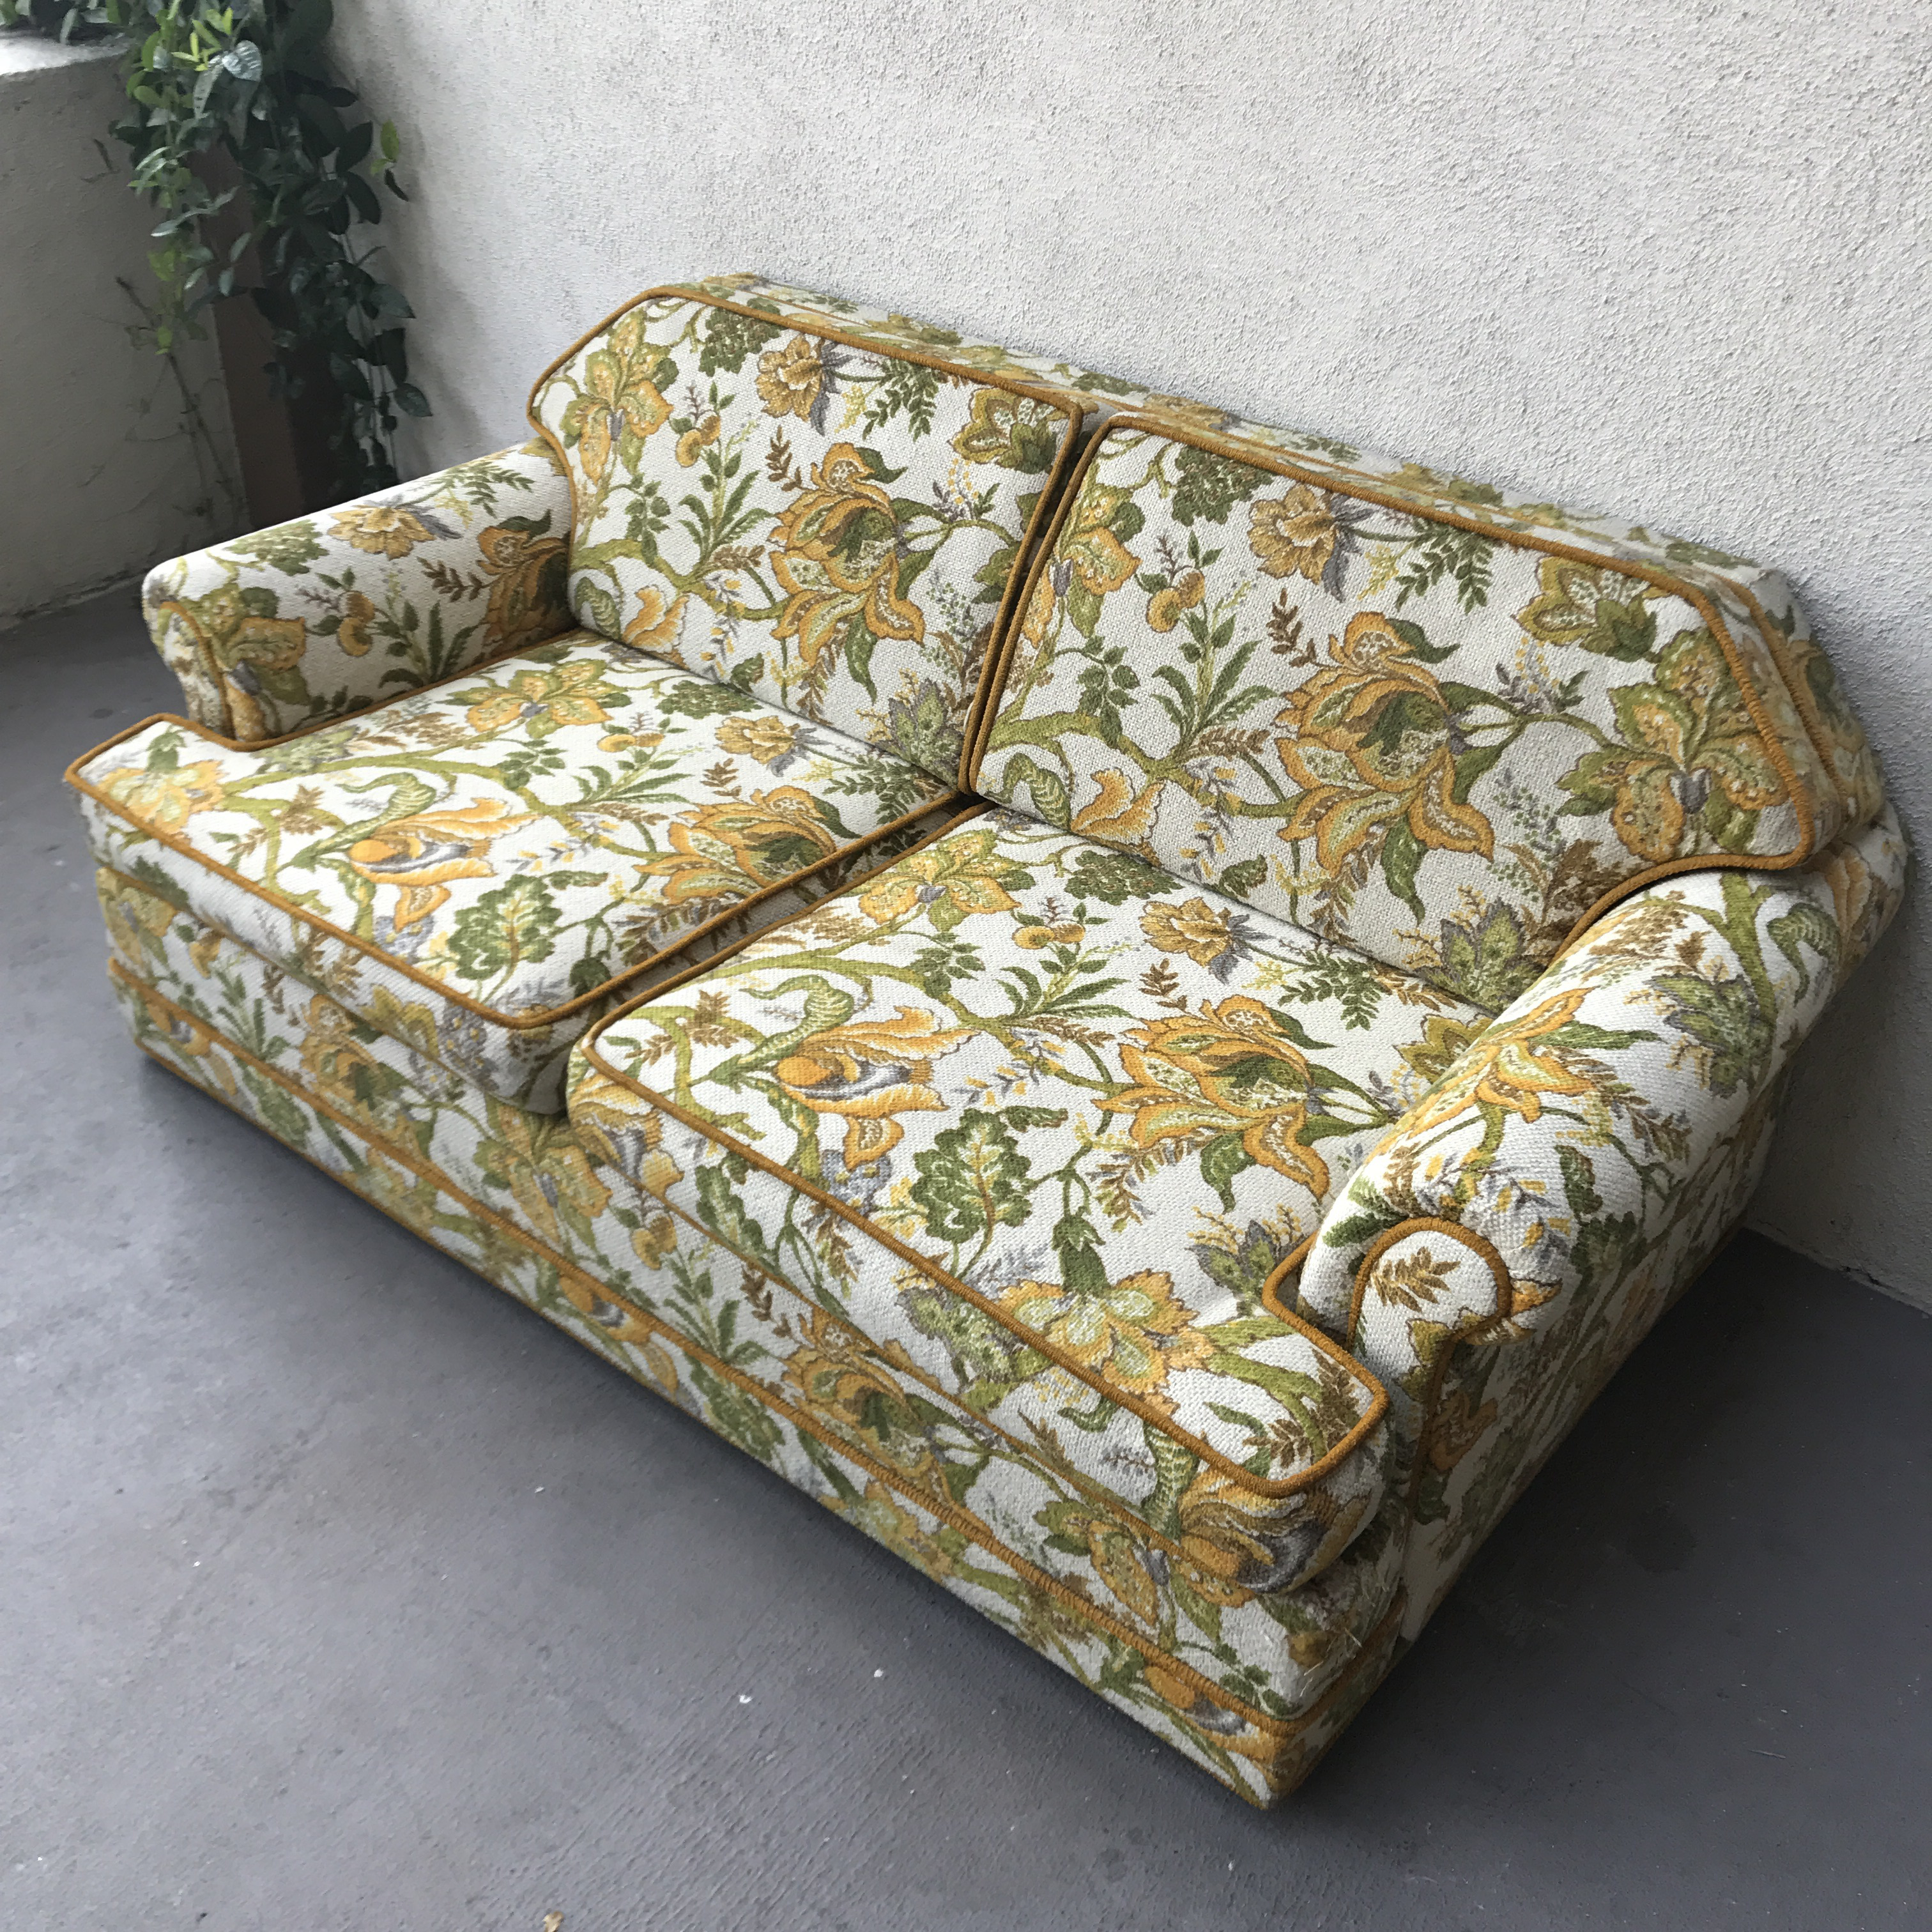 Charming Vintage Mid Century Modern Upholstered Floral Sofa   Image 3 Of 8